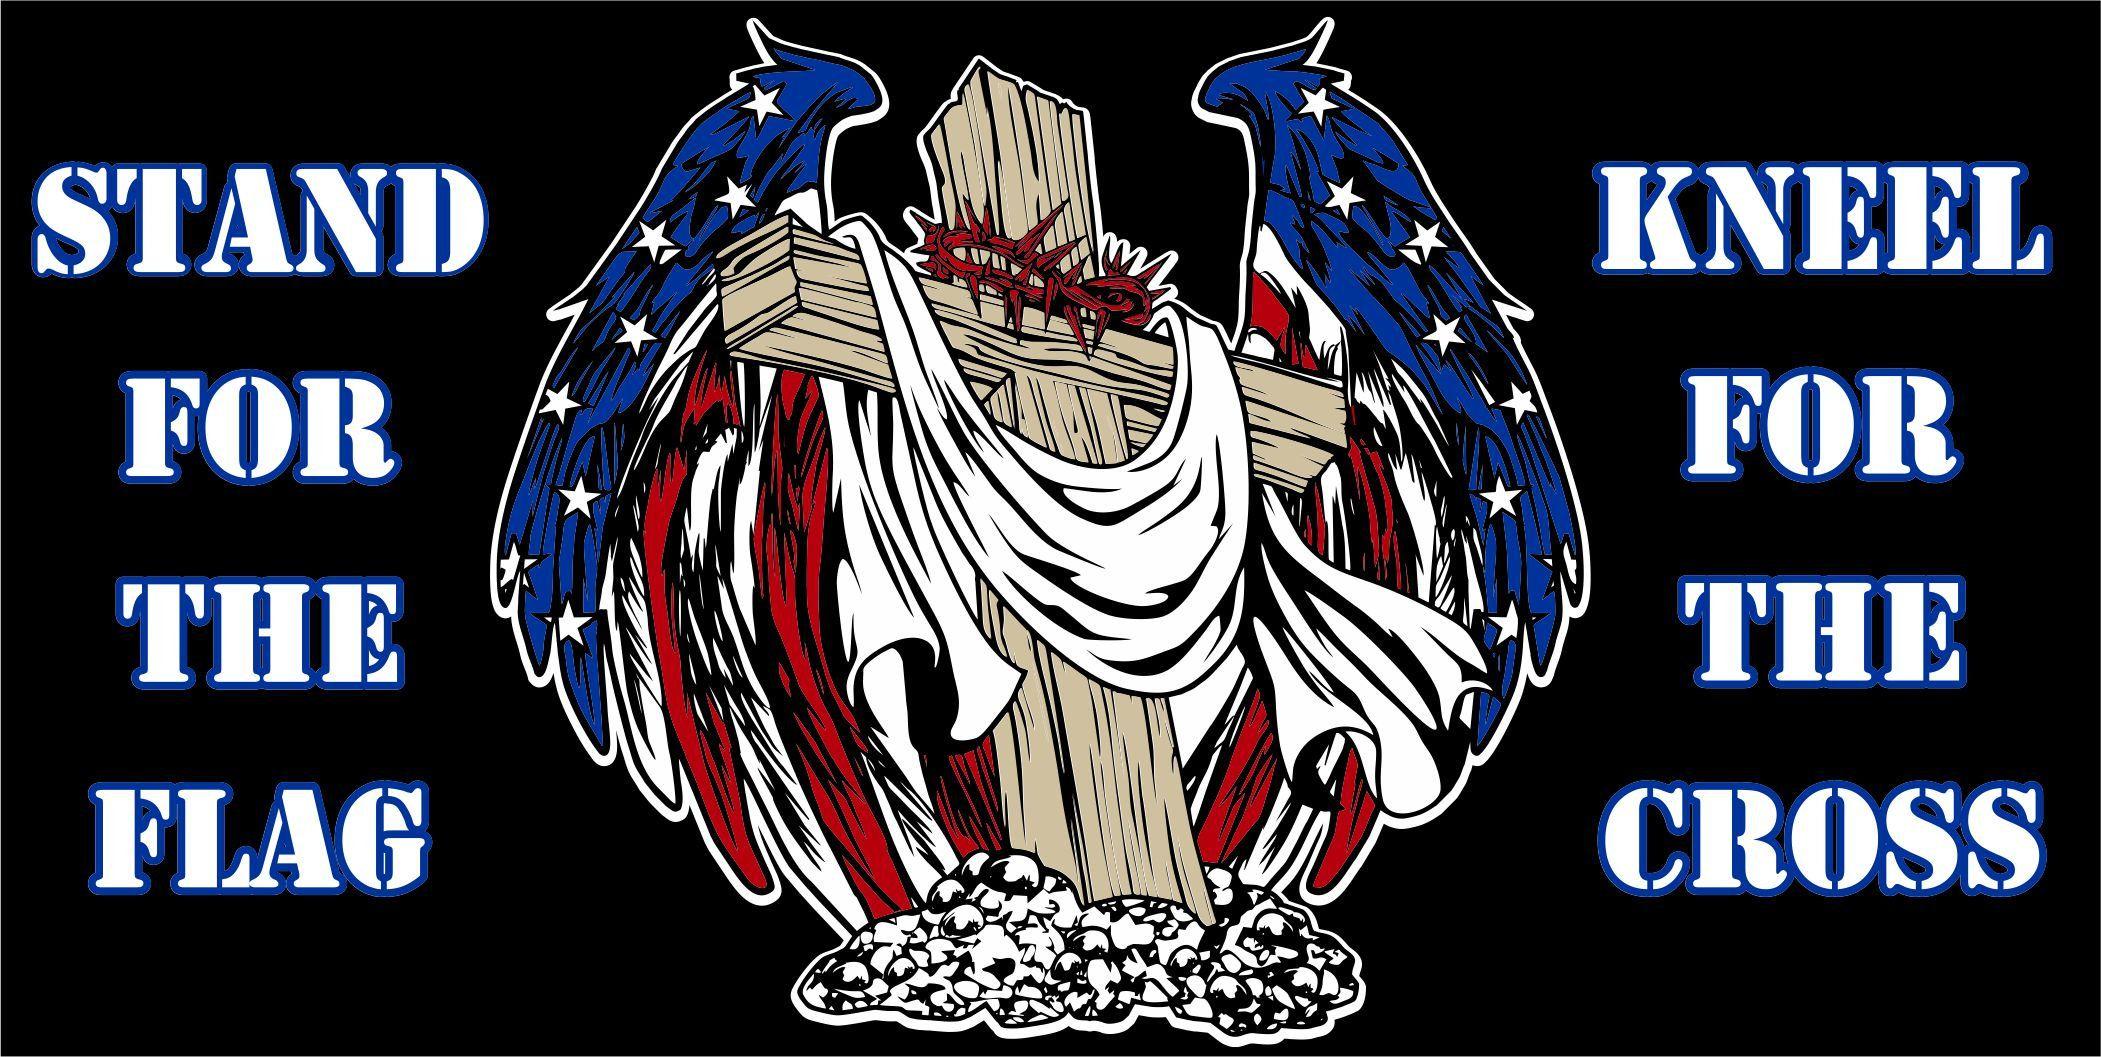 Cross Flag Jesus Christ Christian America Usa Eagle Wings Country Land Freedom Car Truck Window Vinyl Decal Sticker Custom Vinyl Decal Cross Flag Vinyl Decals